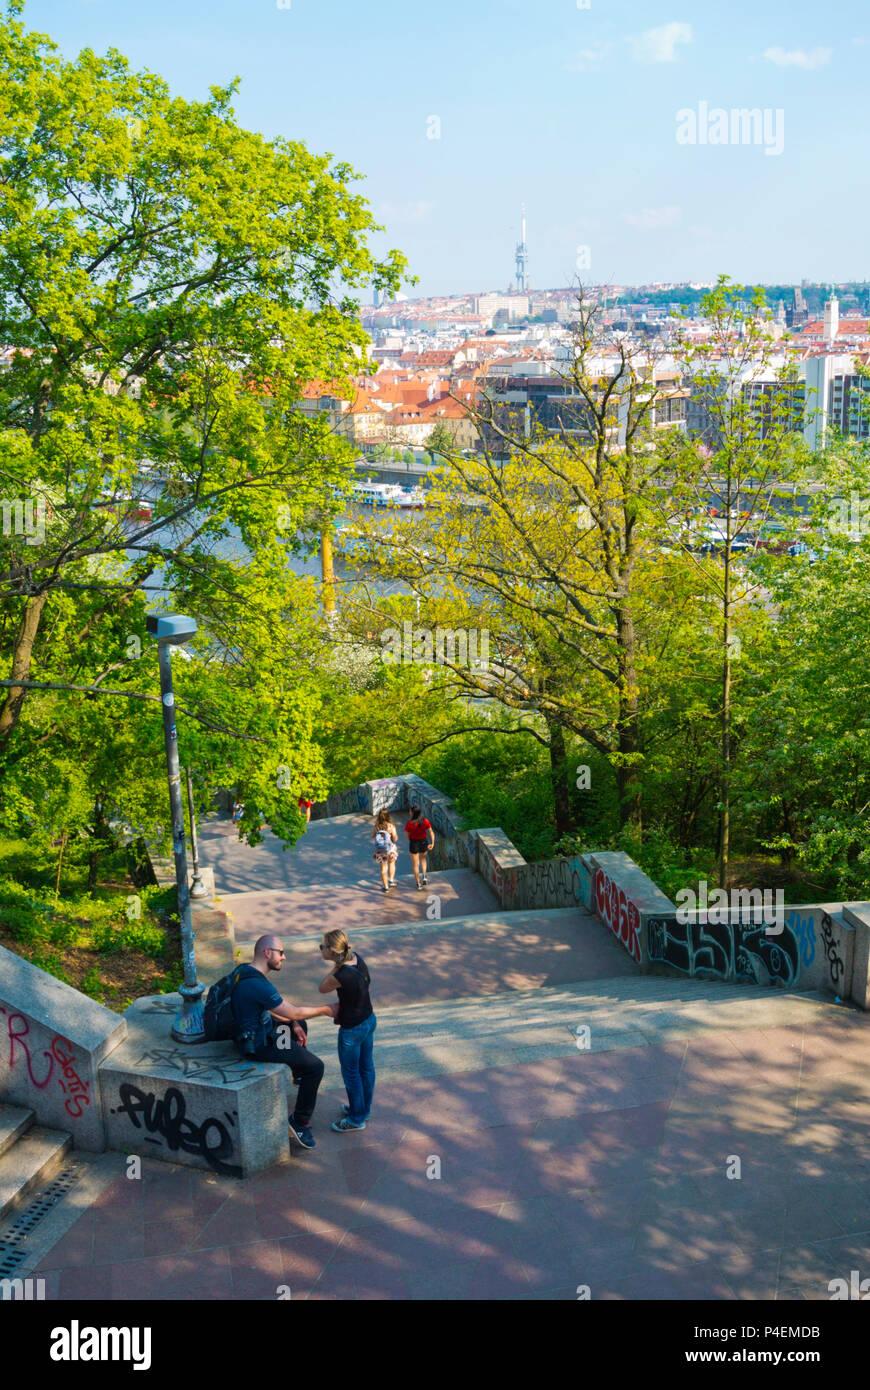 Steps leading from riverfront to the Metronome, Letenske sady, Letna park, Prague, Czech Republic - Stock Image